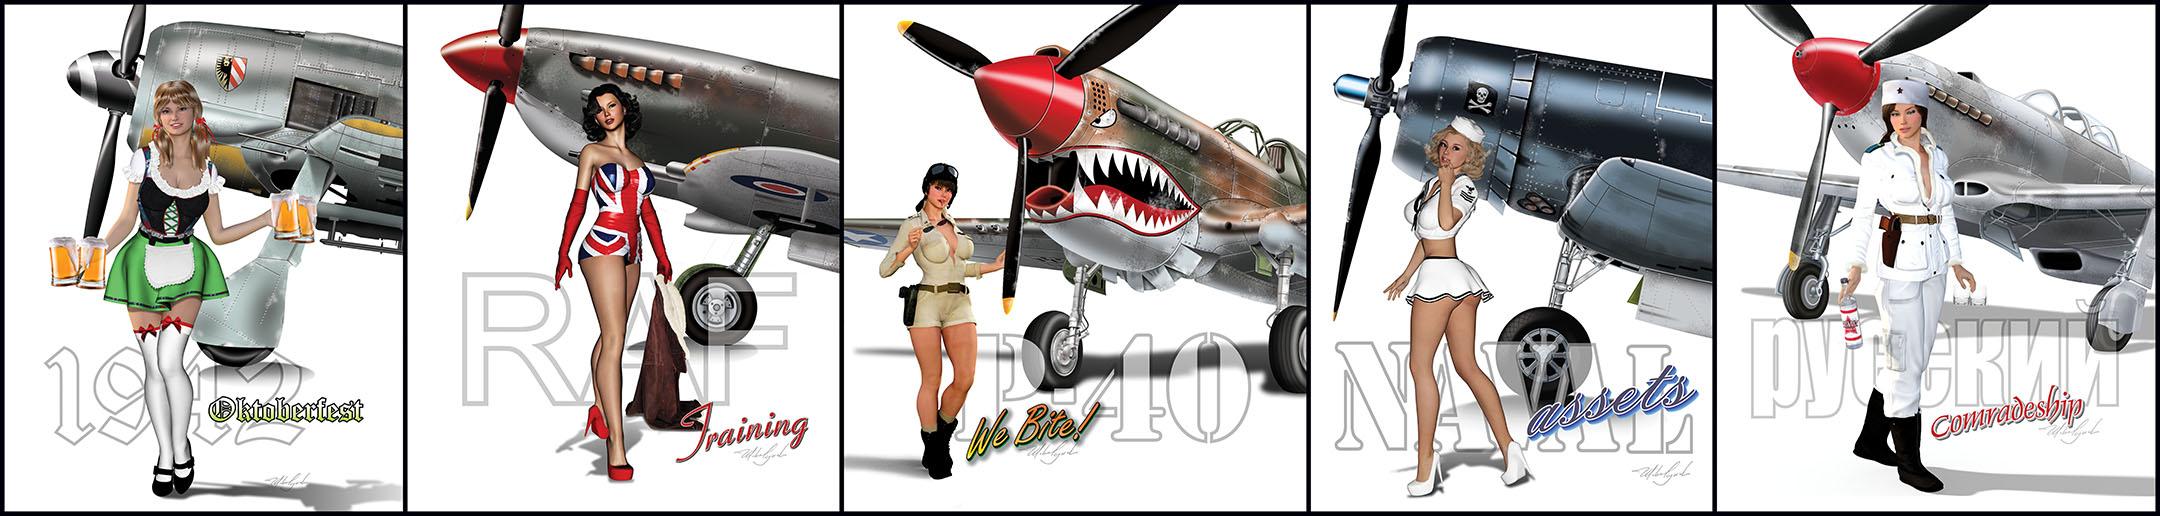 aircraft-pinups-montage2160.jpg